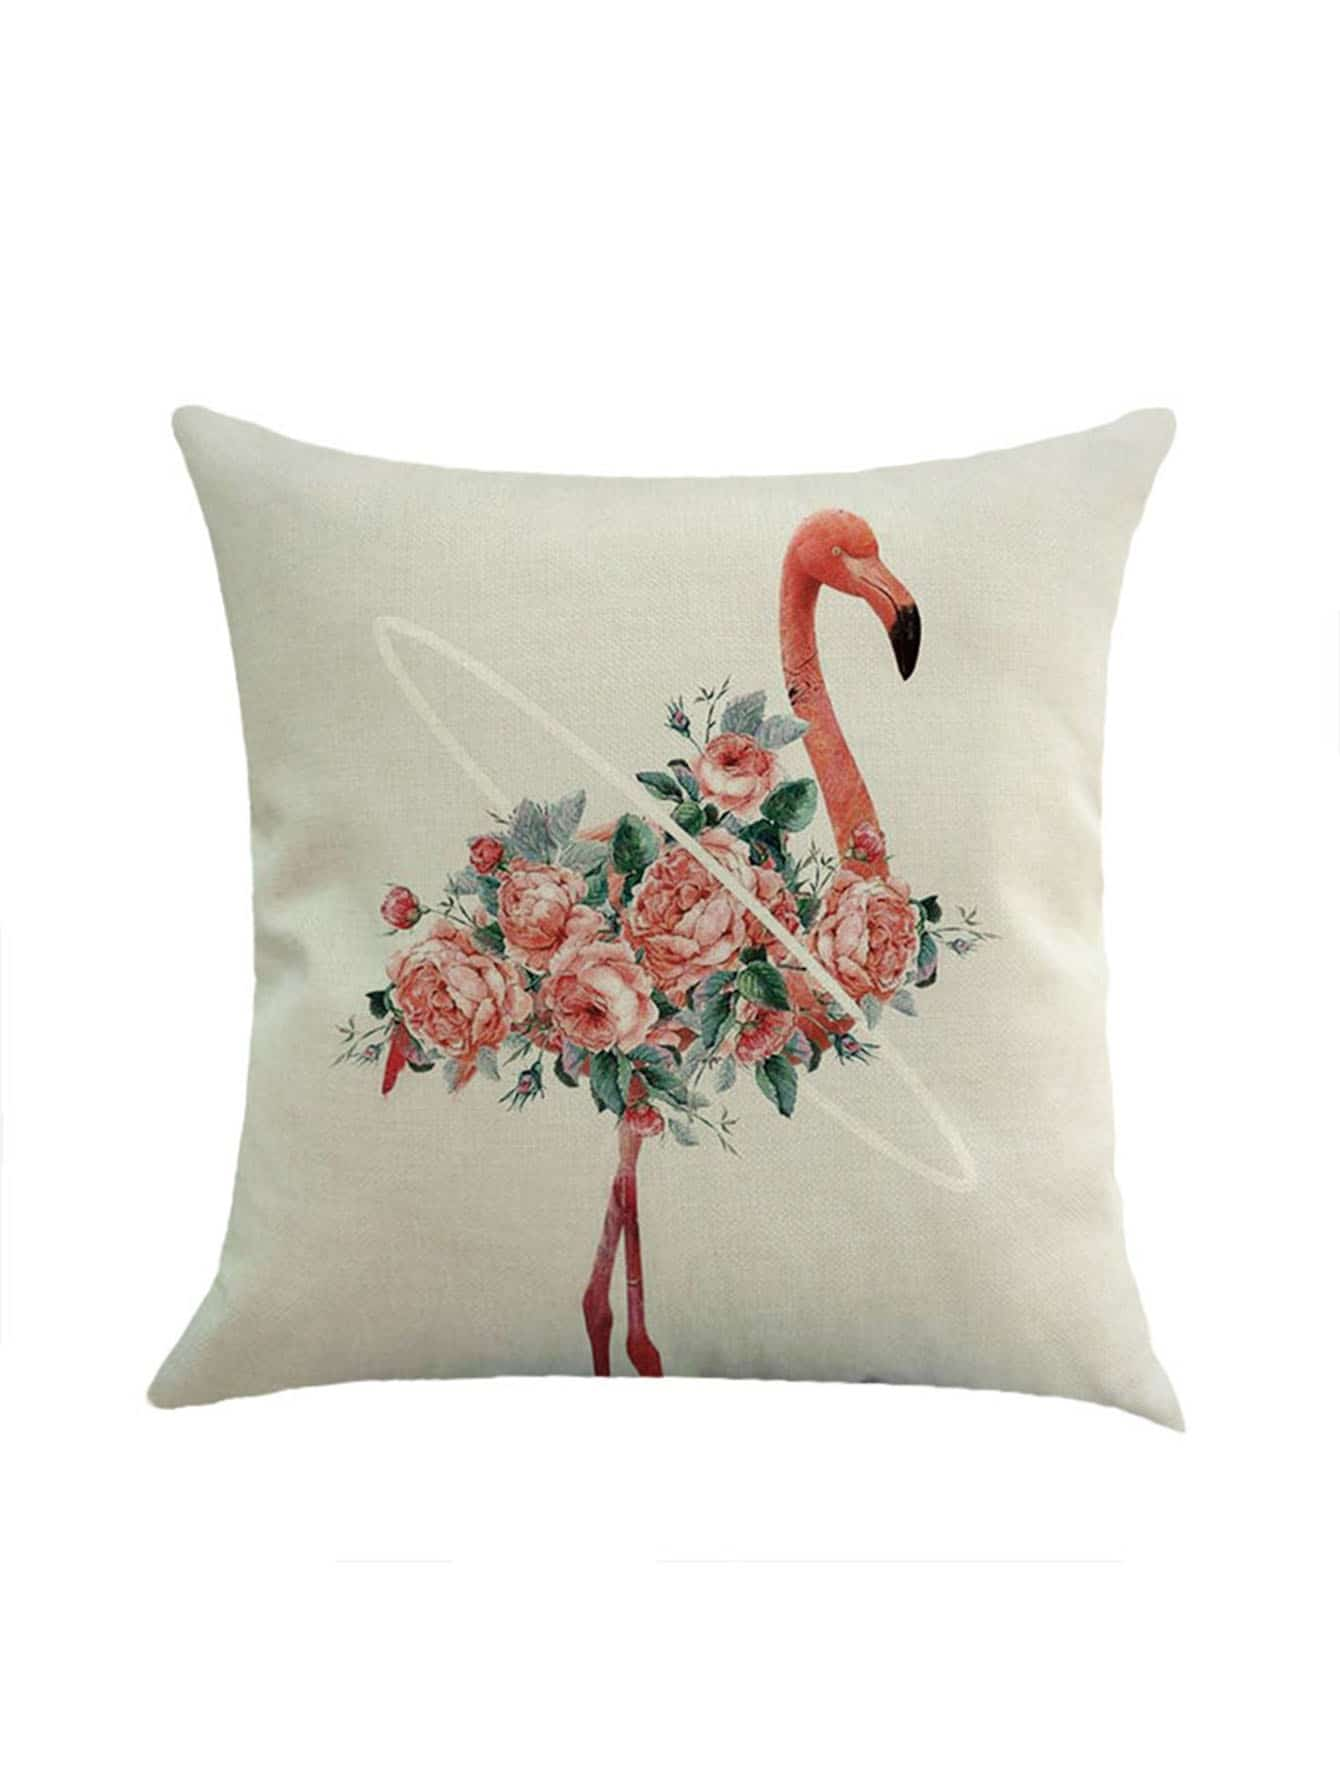 Flower & Flamingo Print Pillowcase Cover